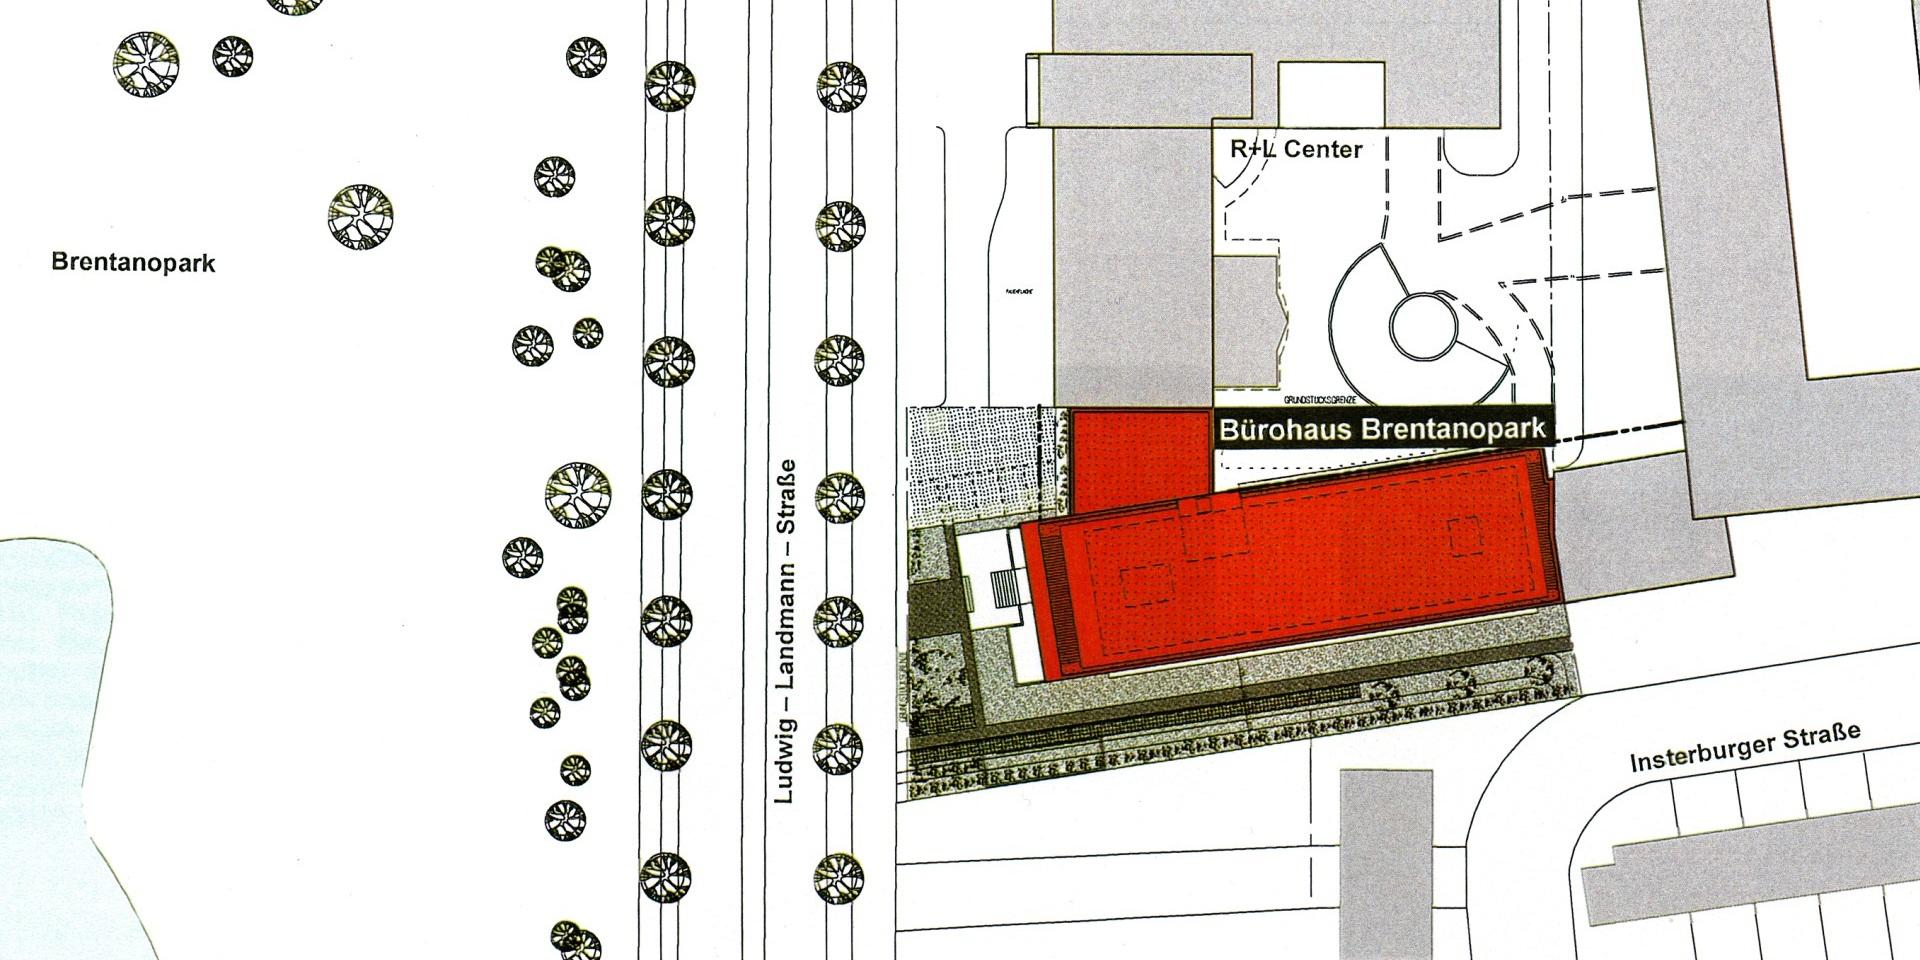 Neubau Bürohaus Brentanopark – Frankfurt am Main Rödelheim, Frick.Reichert Architekten